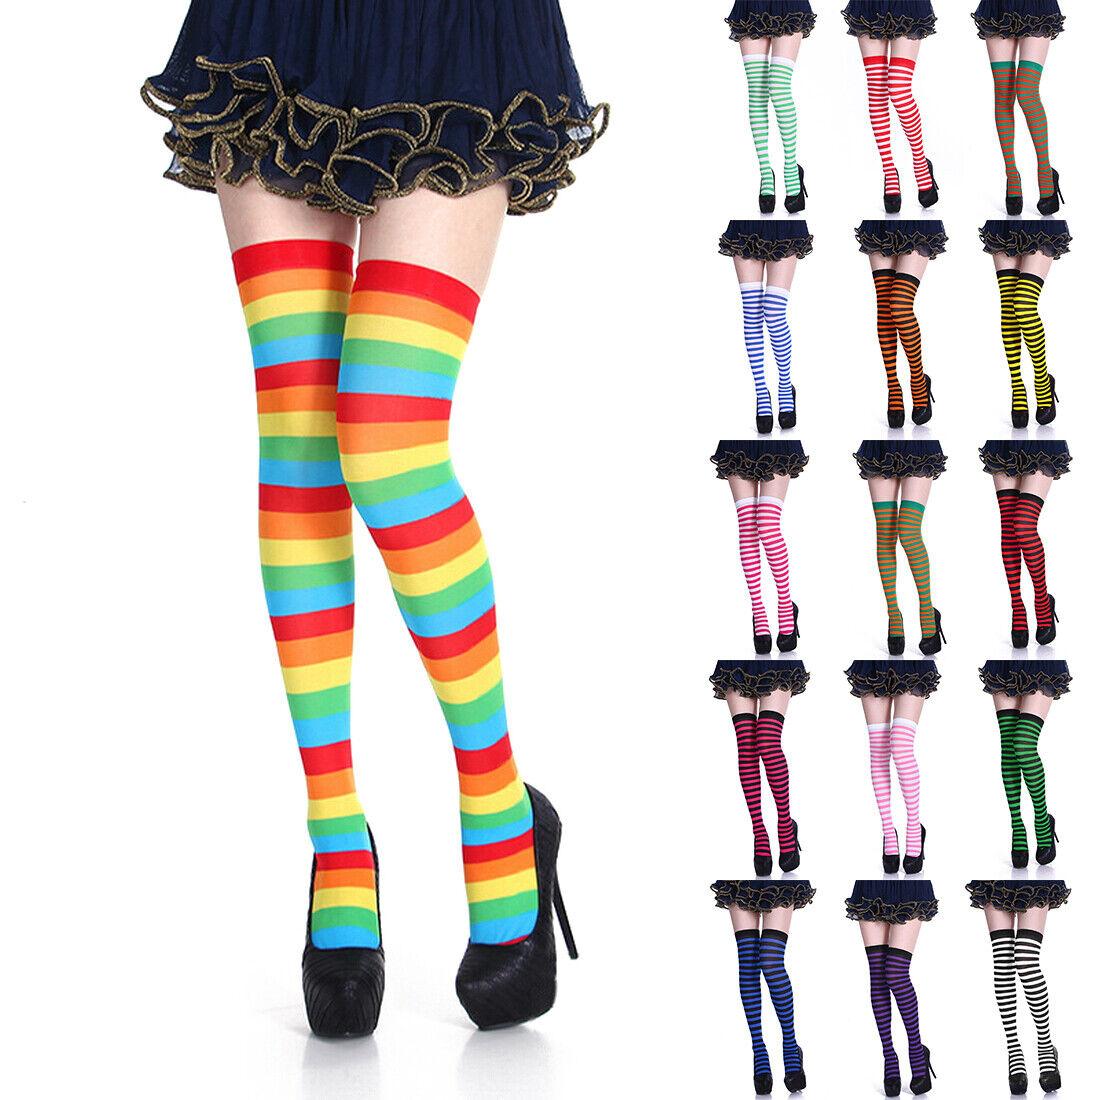 Damen Overknee Strümpfe Gestreift Lang Socken Kniestrümpfe Stockings Leggings